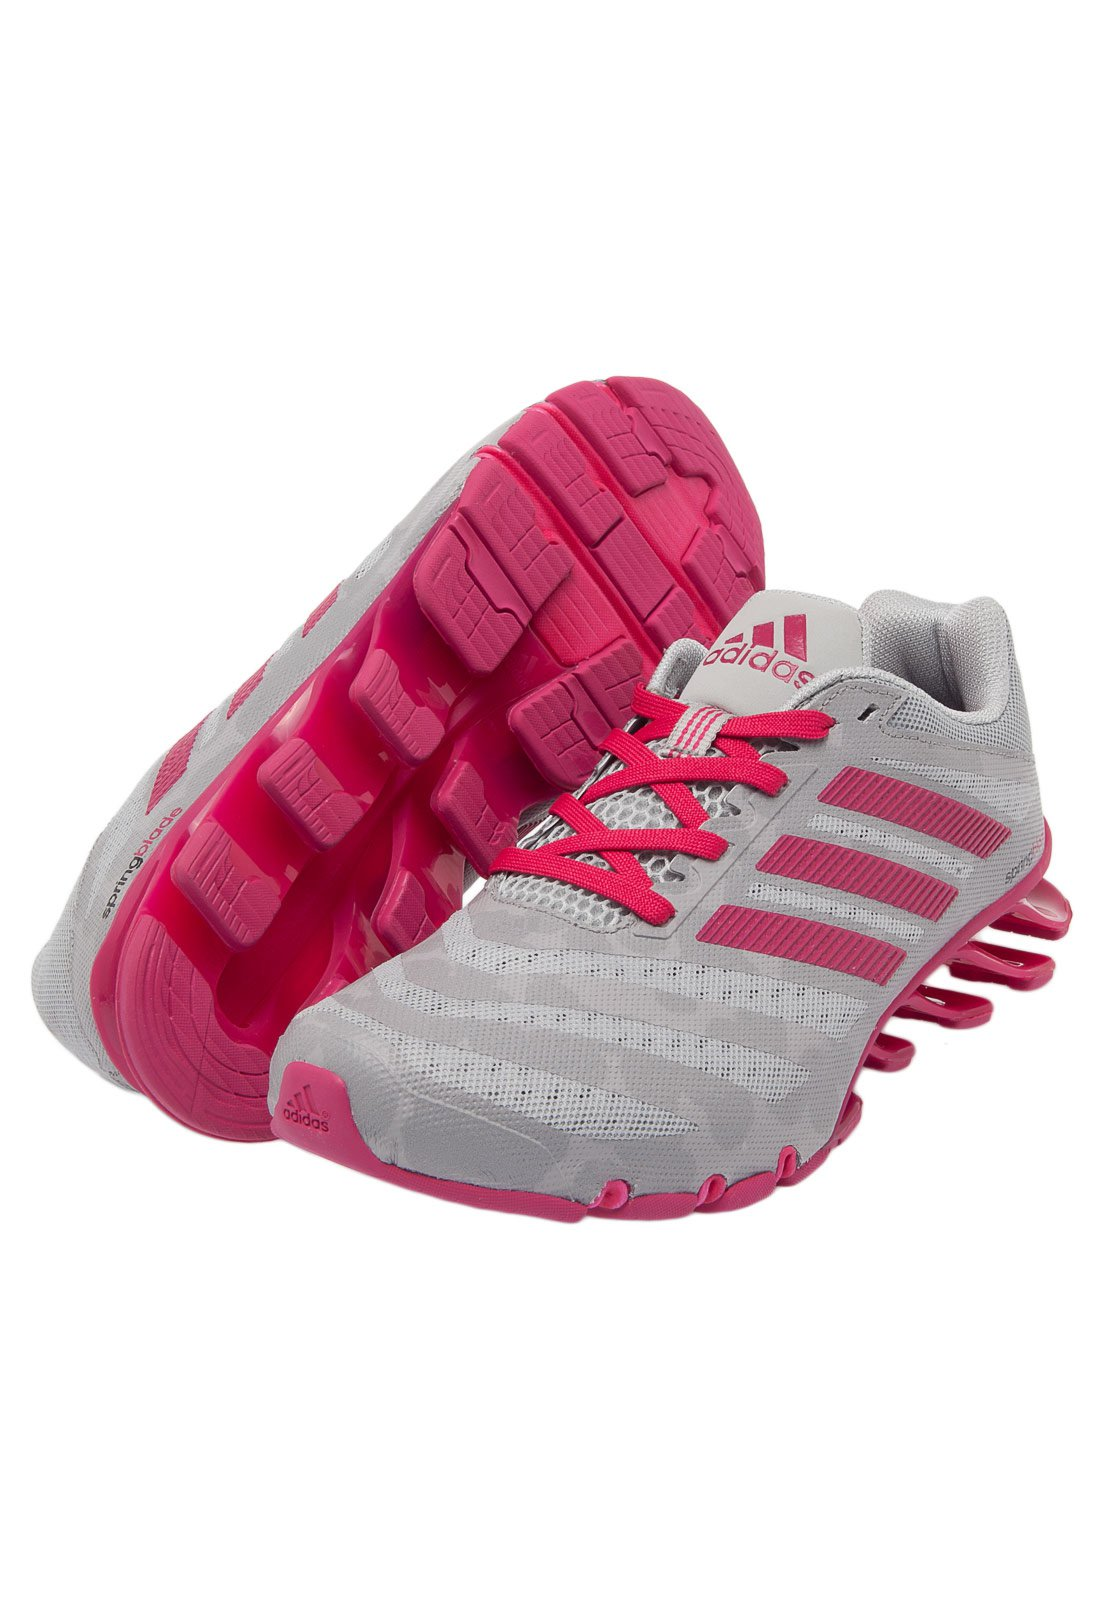 adidas springblade 4 cinza e rosa